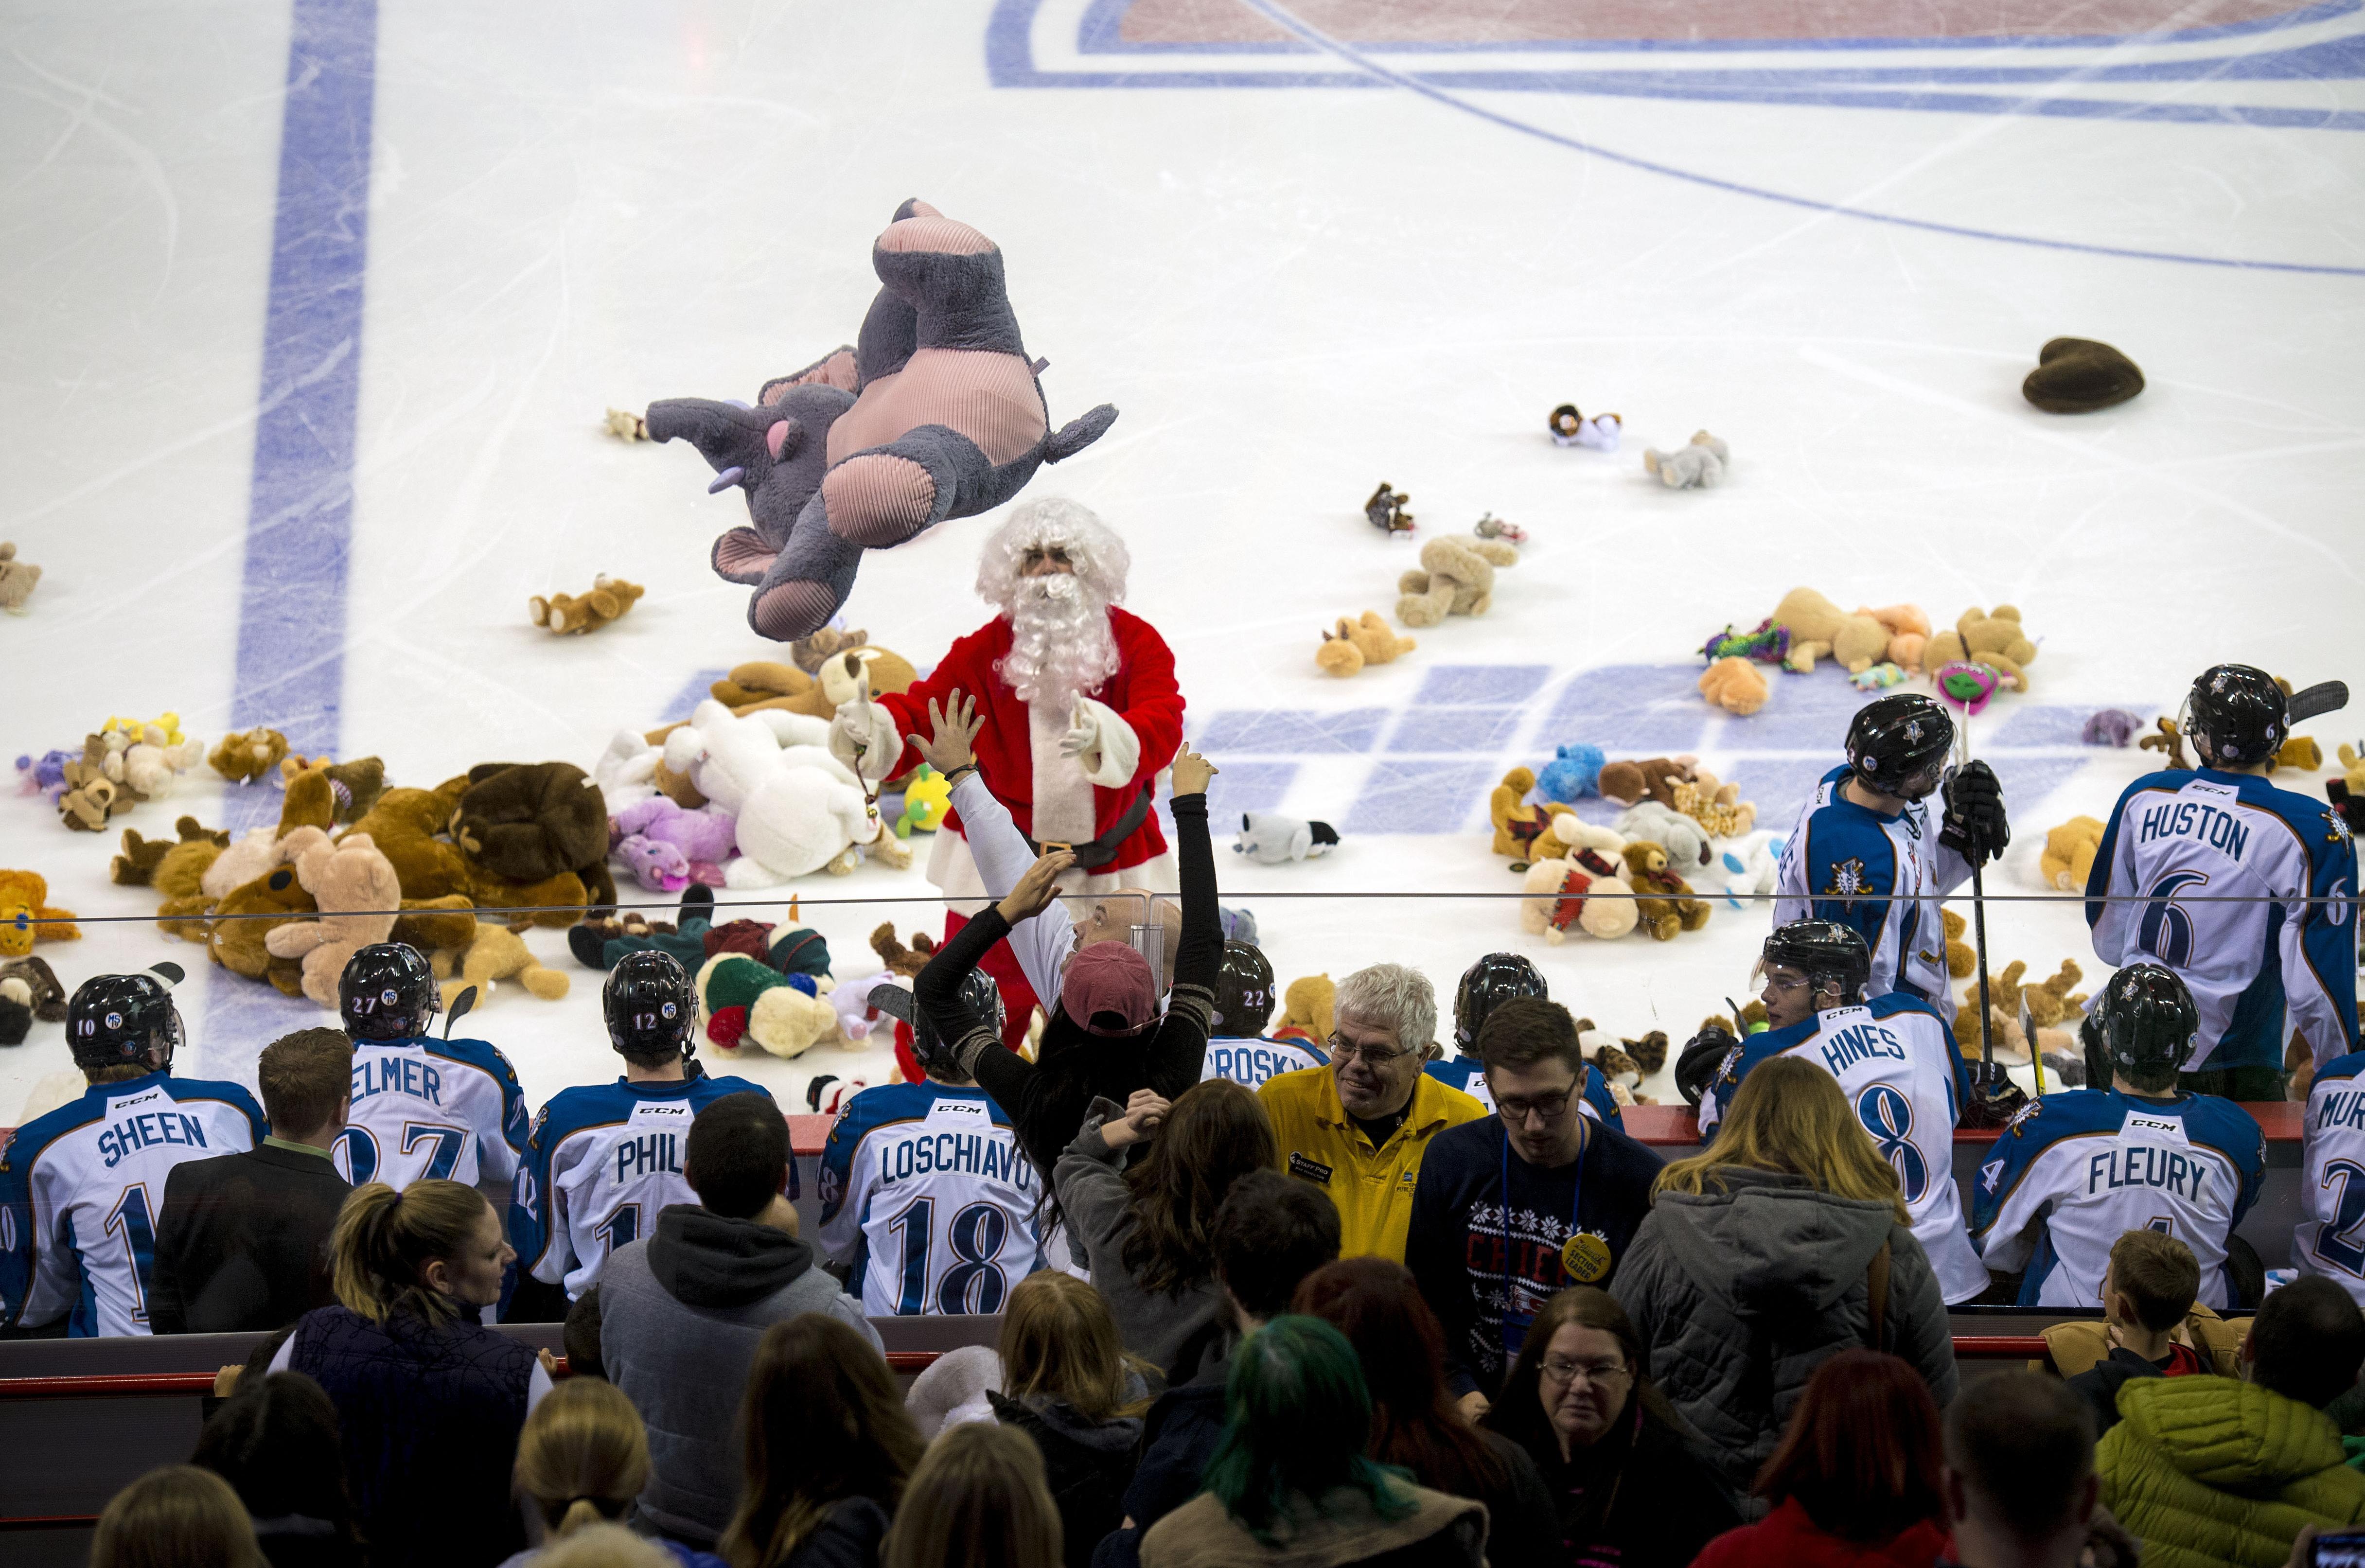 83259e09e The annual Teddy Bear Toss returns to the Spokane Arena on Dec. 9 when the